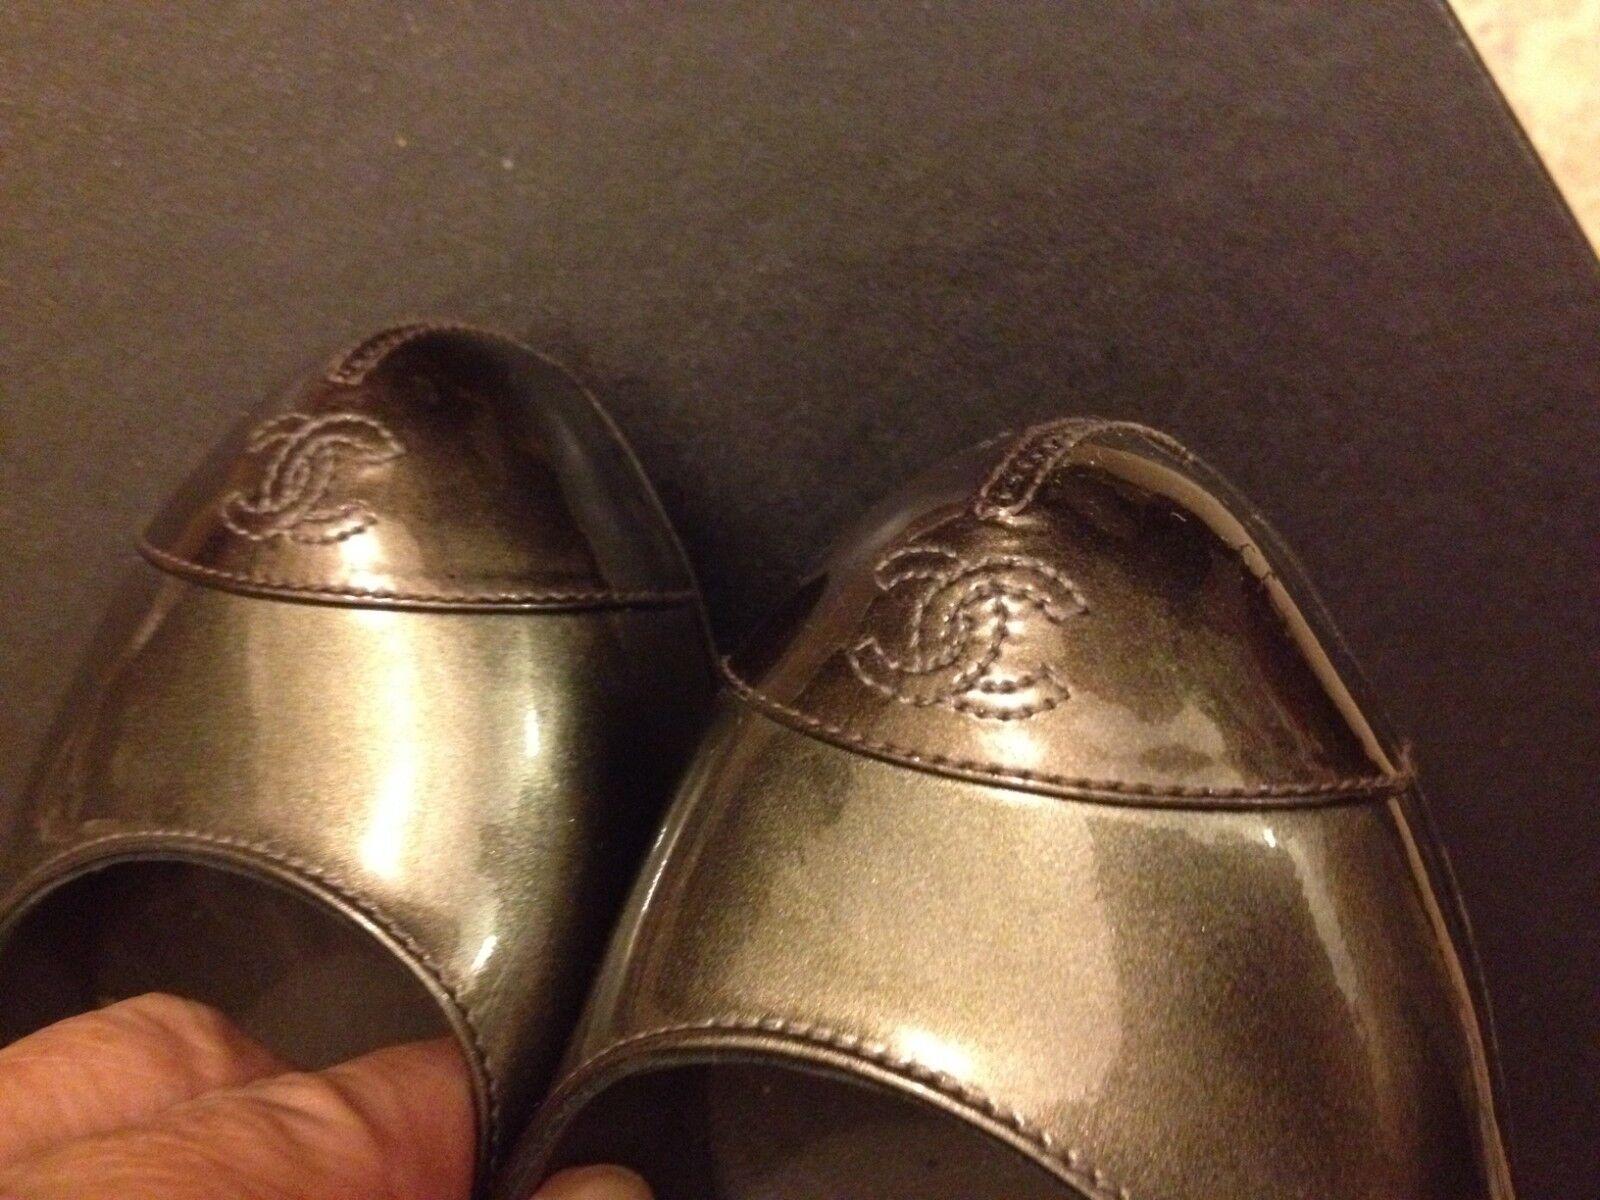 CHAEL RUNWAY CC LOGO ELEGANT CLASSIC PAT LEHER STILETTO  PUMP scarpe 37  950  ti renderà soddisfatto